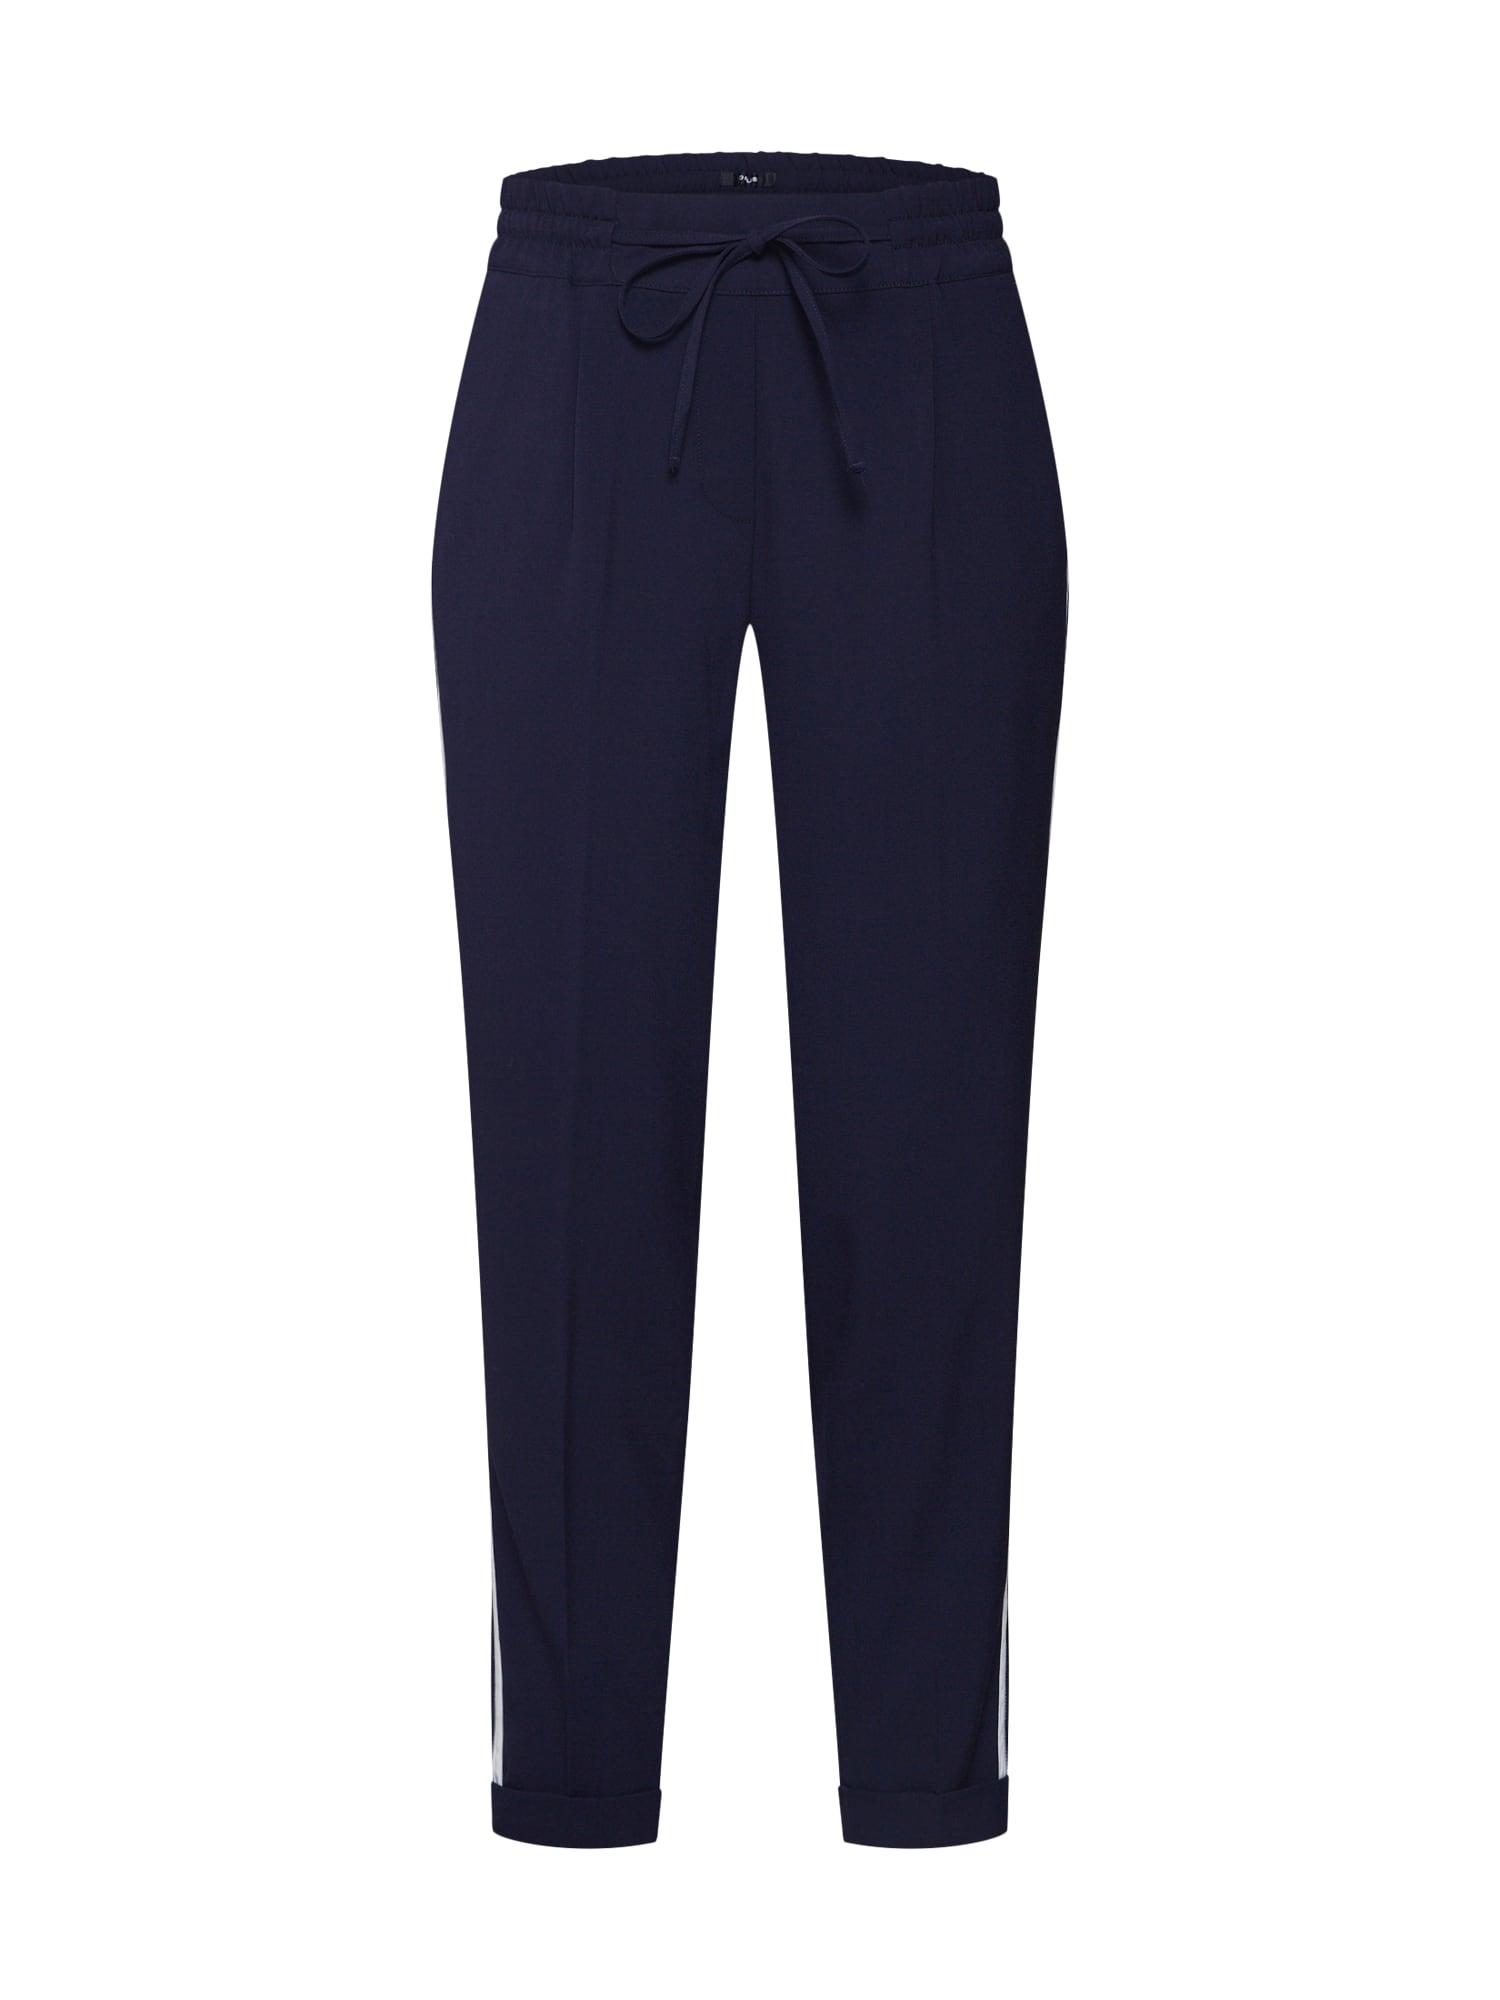 OPUS Plisované nohavice 'Melosa pin'  modrá